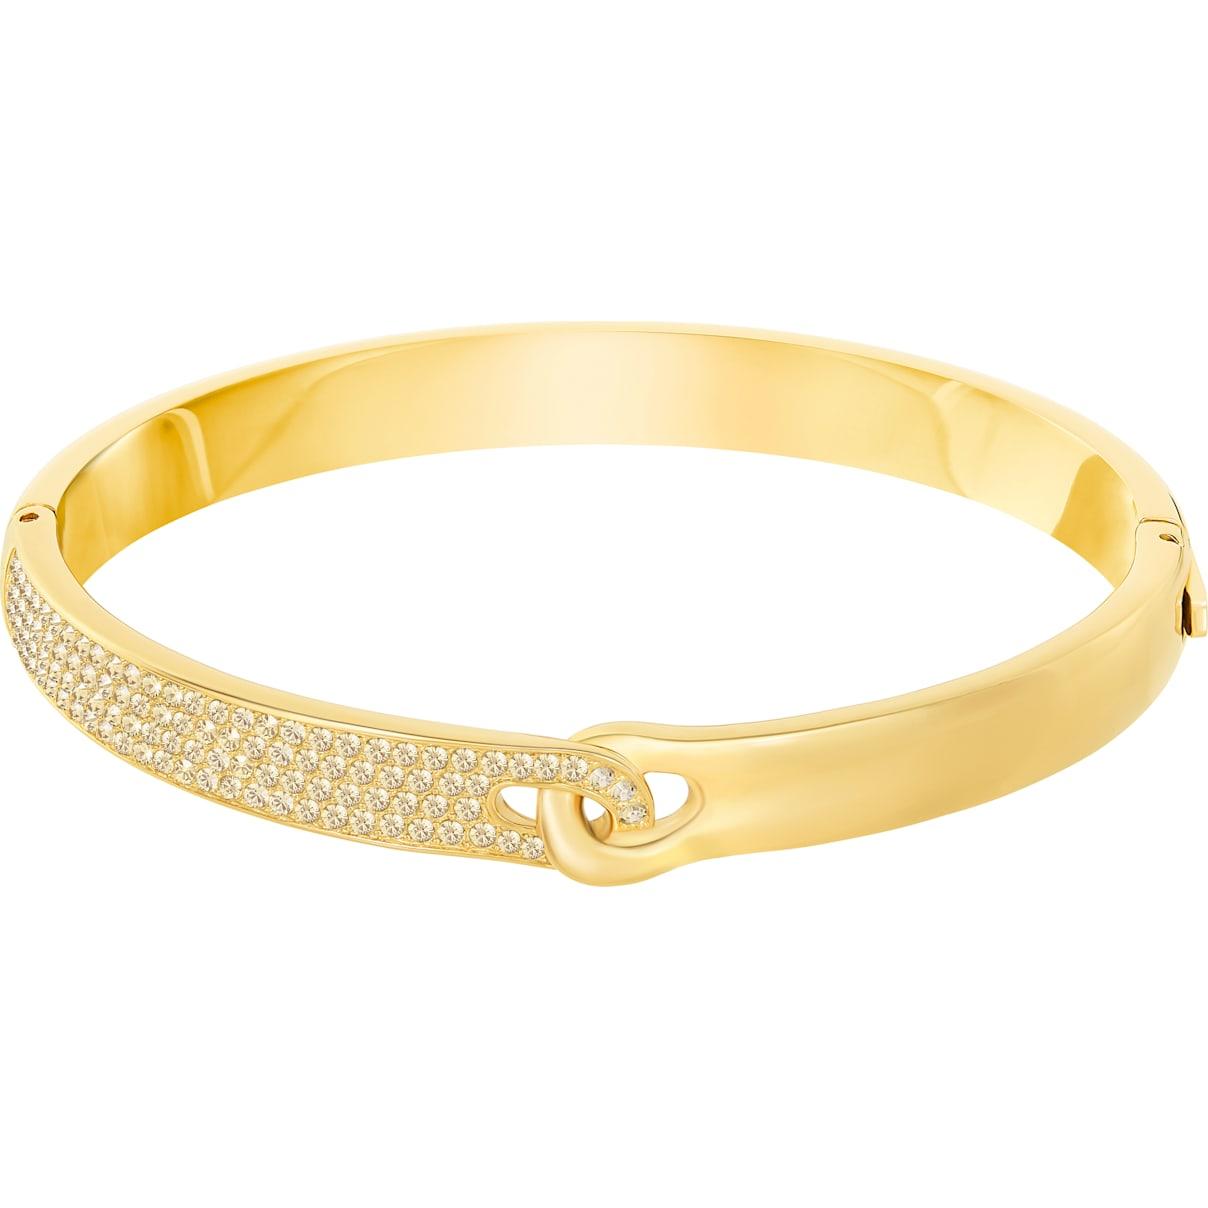 Swarovski Gallon Narrow Bangle, Golden, Gold-tone plated